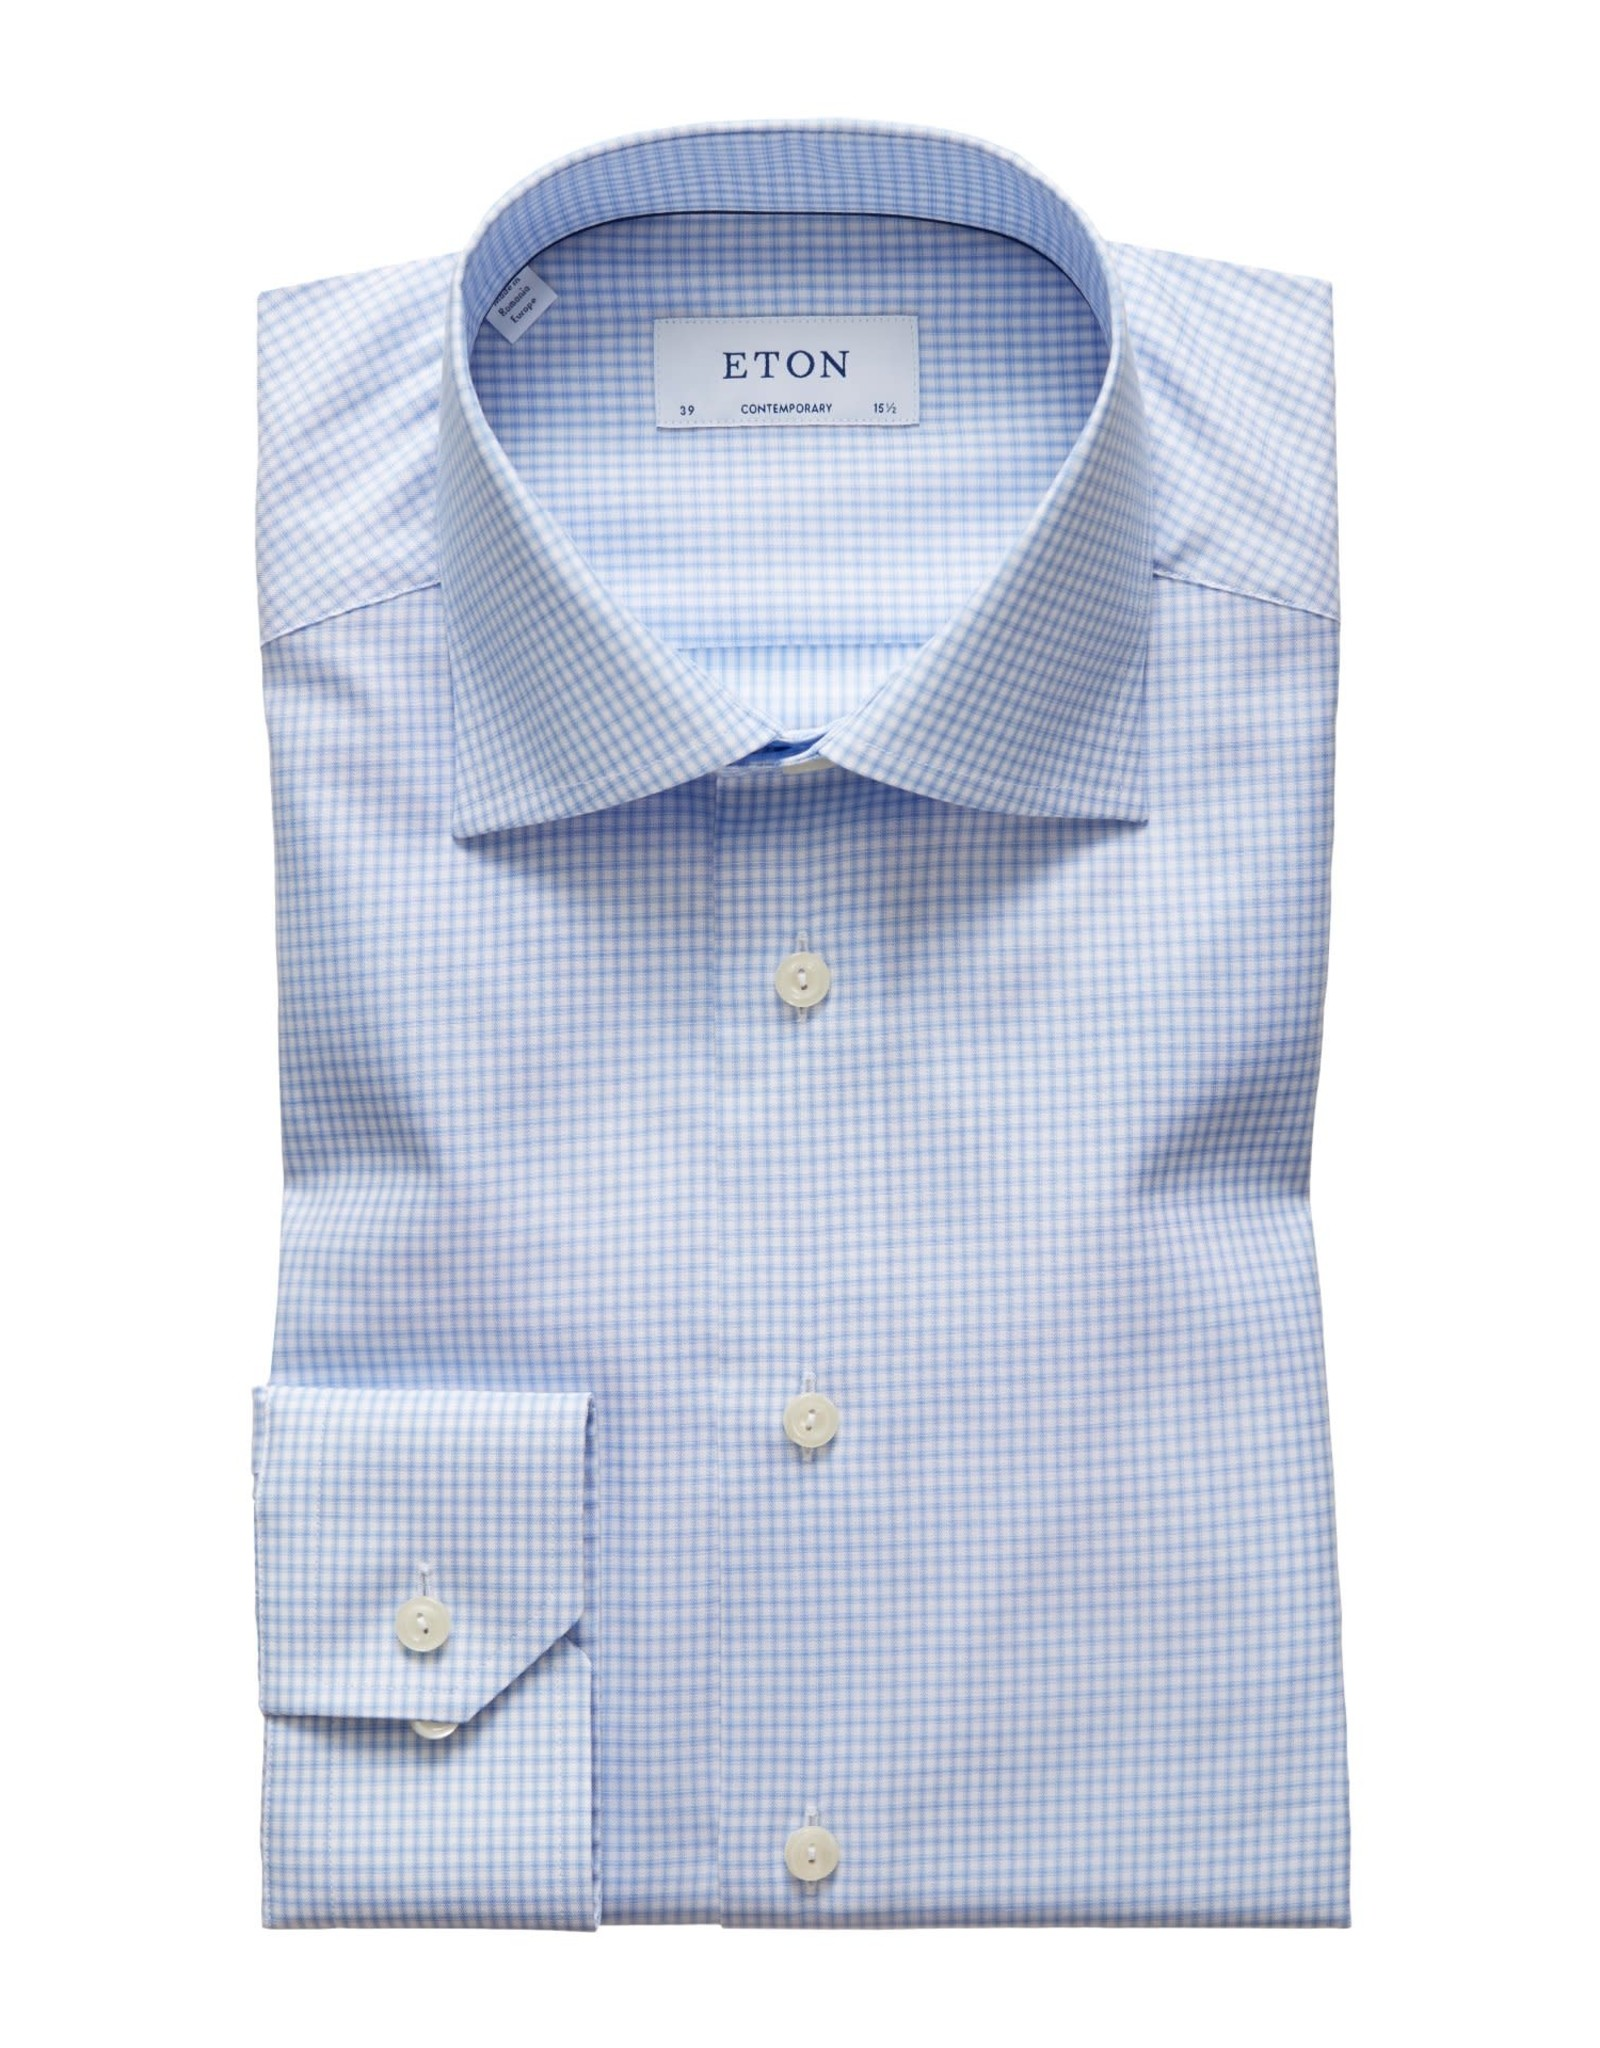 Eton Eton hemd blauw contemporary 3410-79311/21